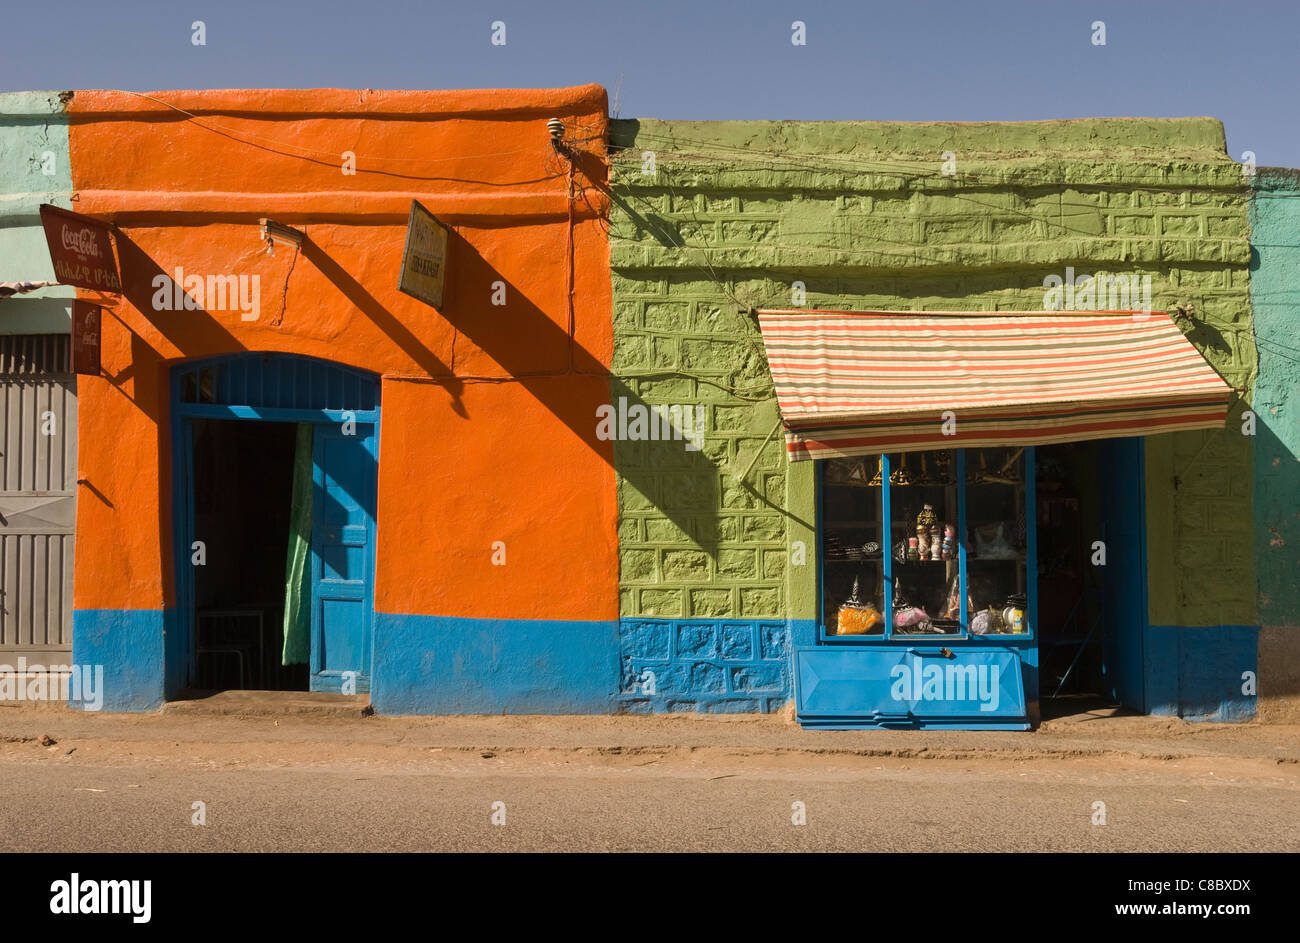 Elk200-4084 Ethiopia, Harar, street scene with shops - Stock Image